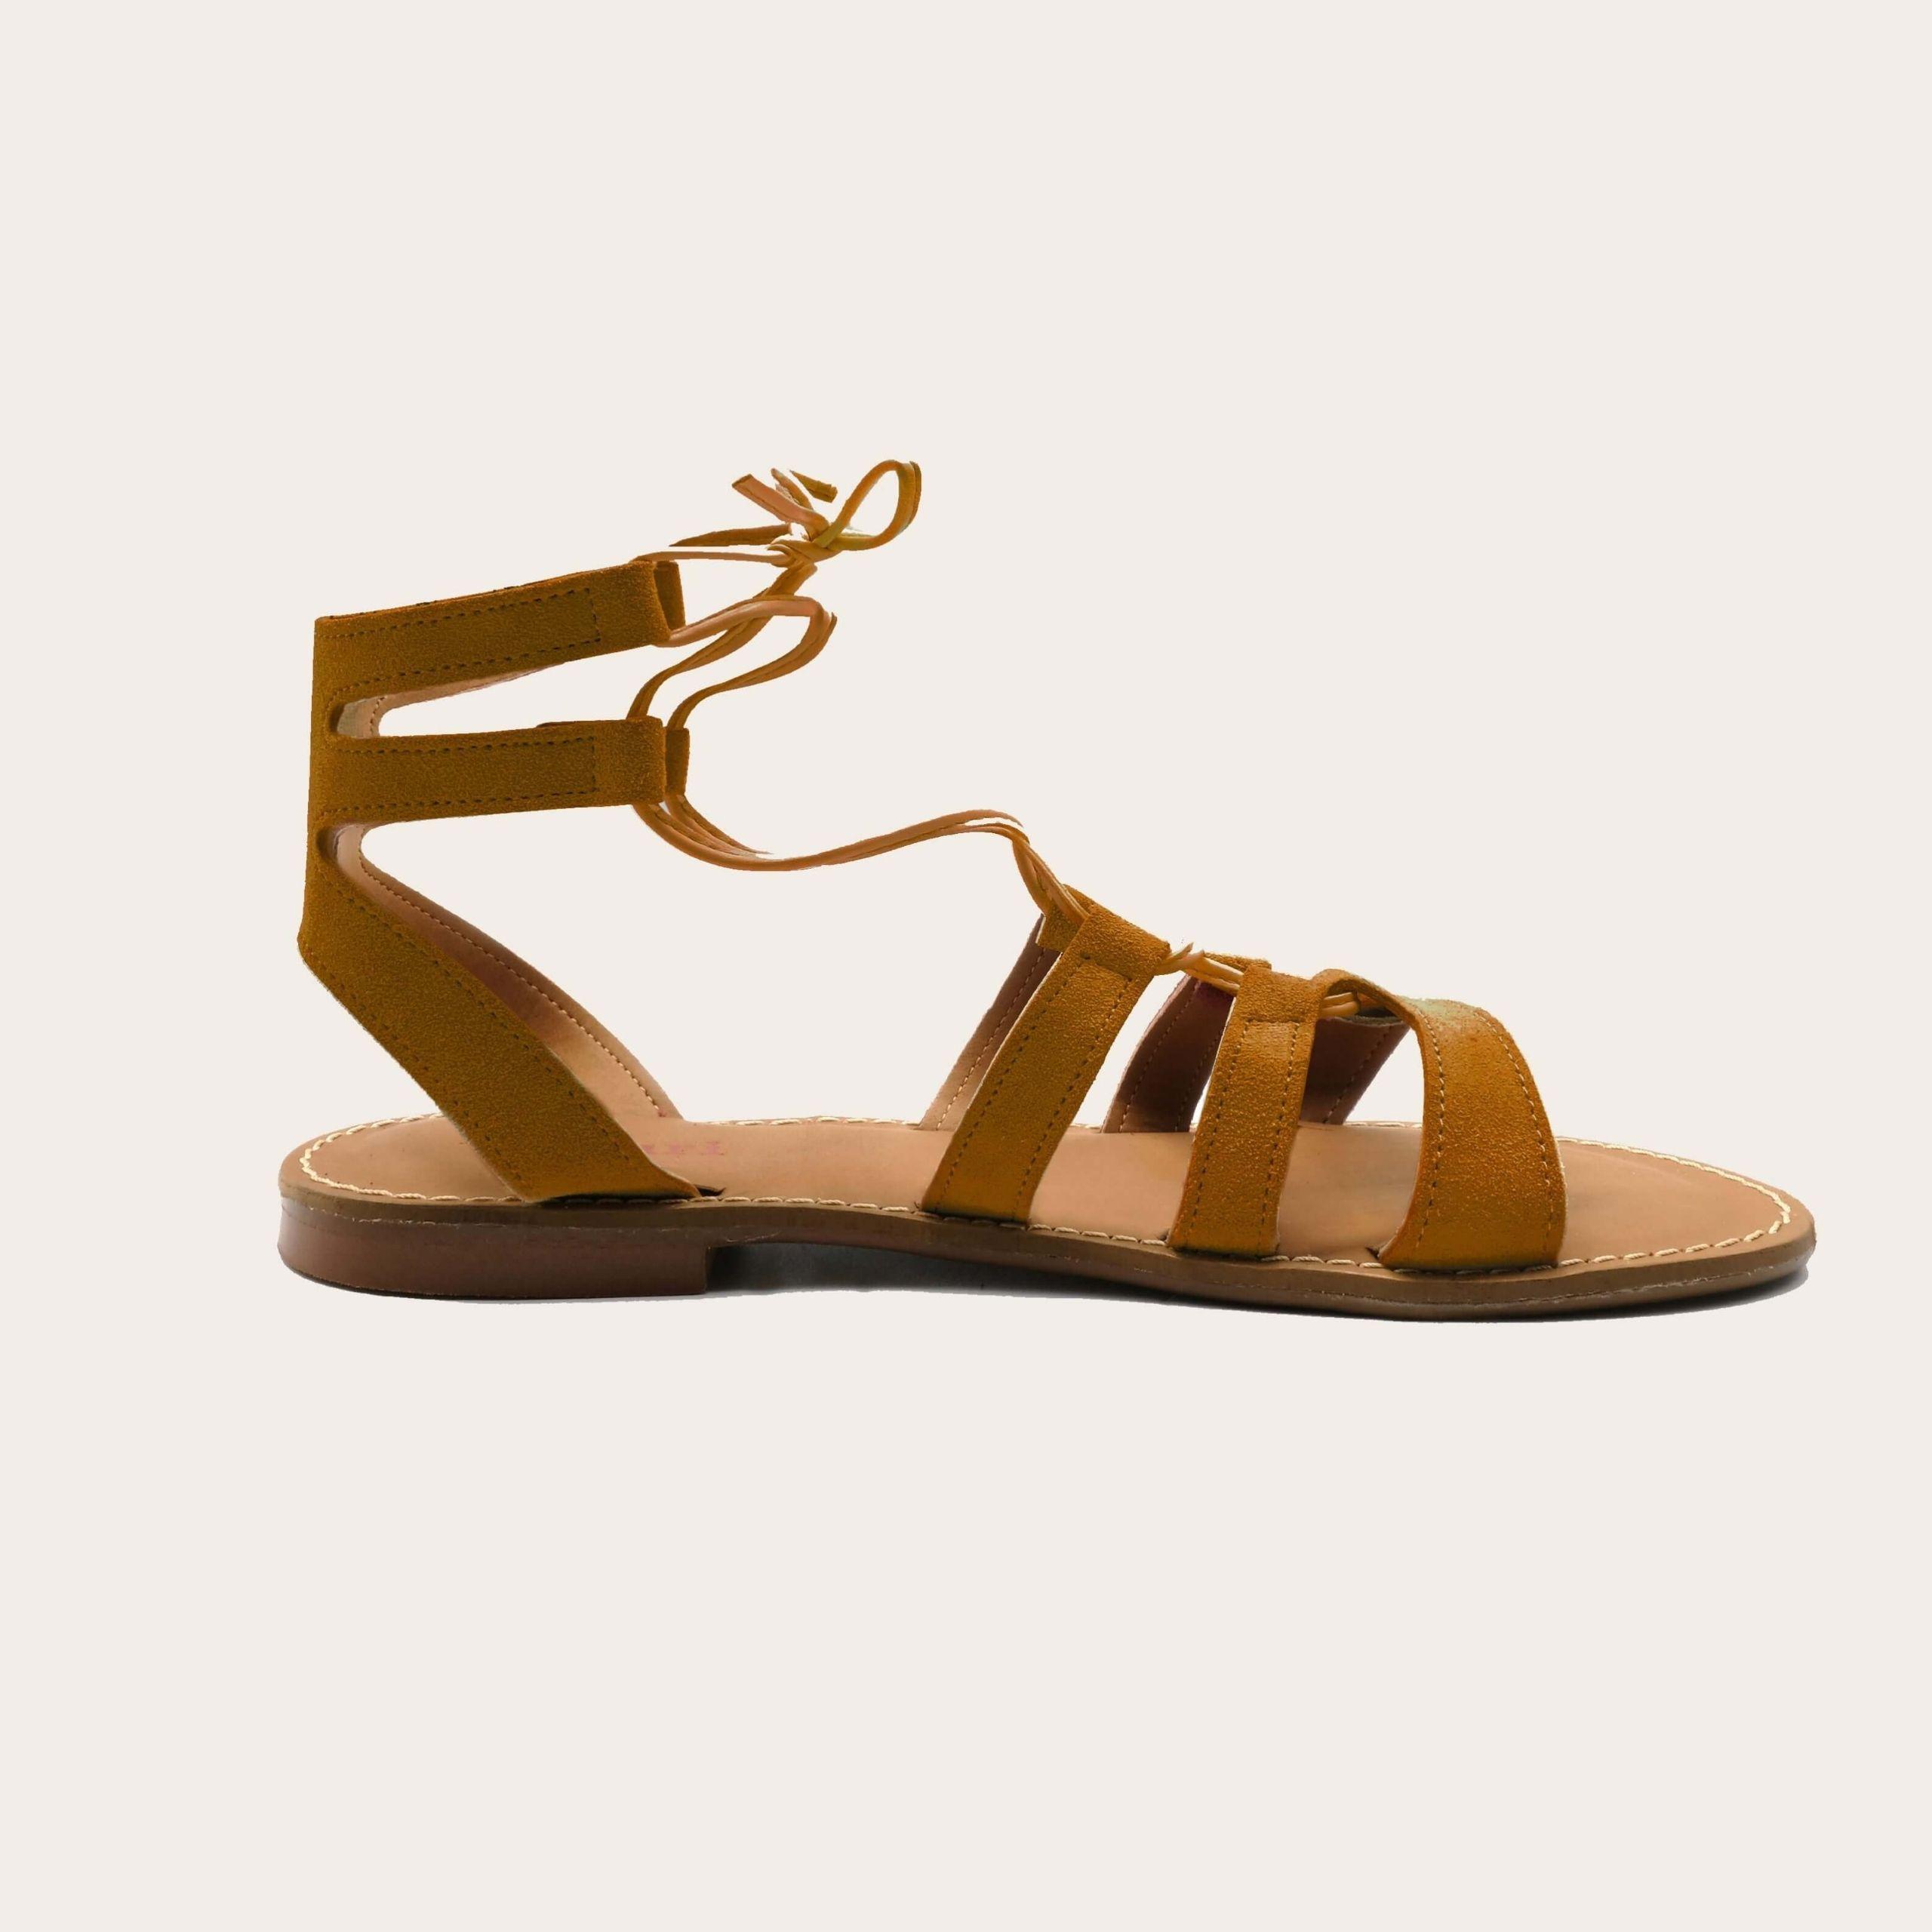 fe-camel_lintsandalen sandals travelsandals vegan sustainable sandals wikkelsandalen